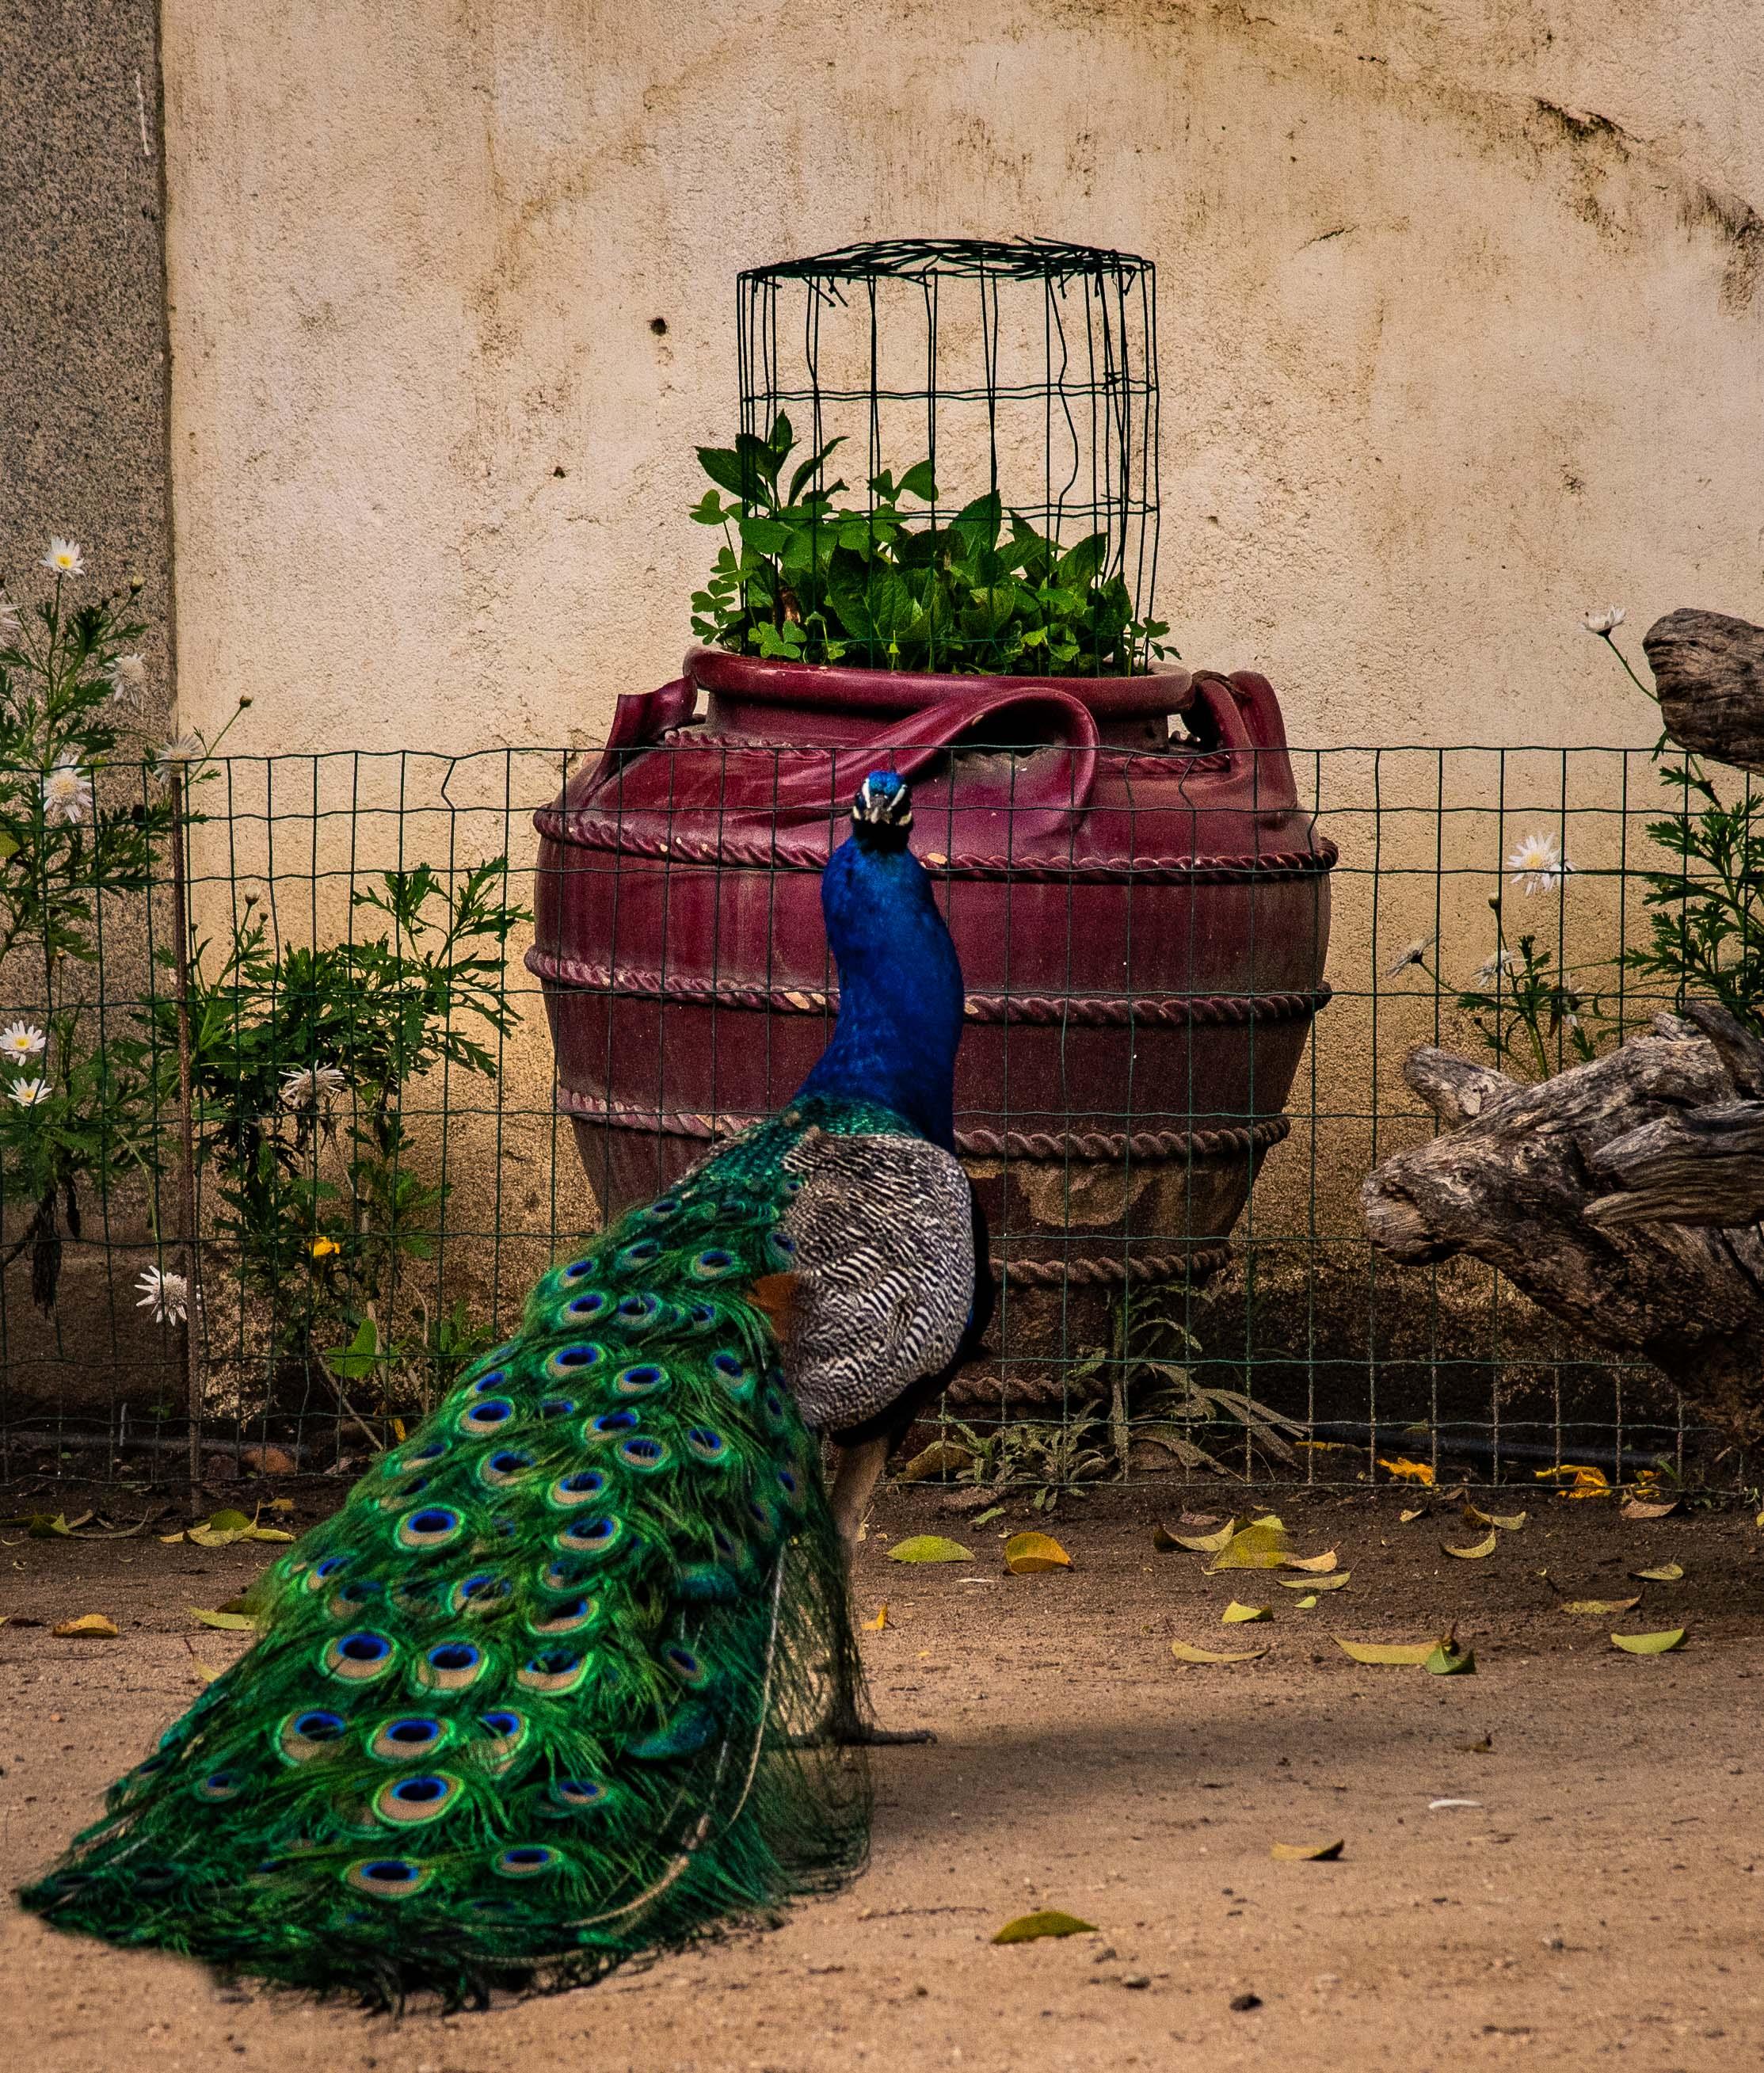 Peacock. Evora, Spain 2018